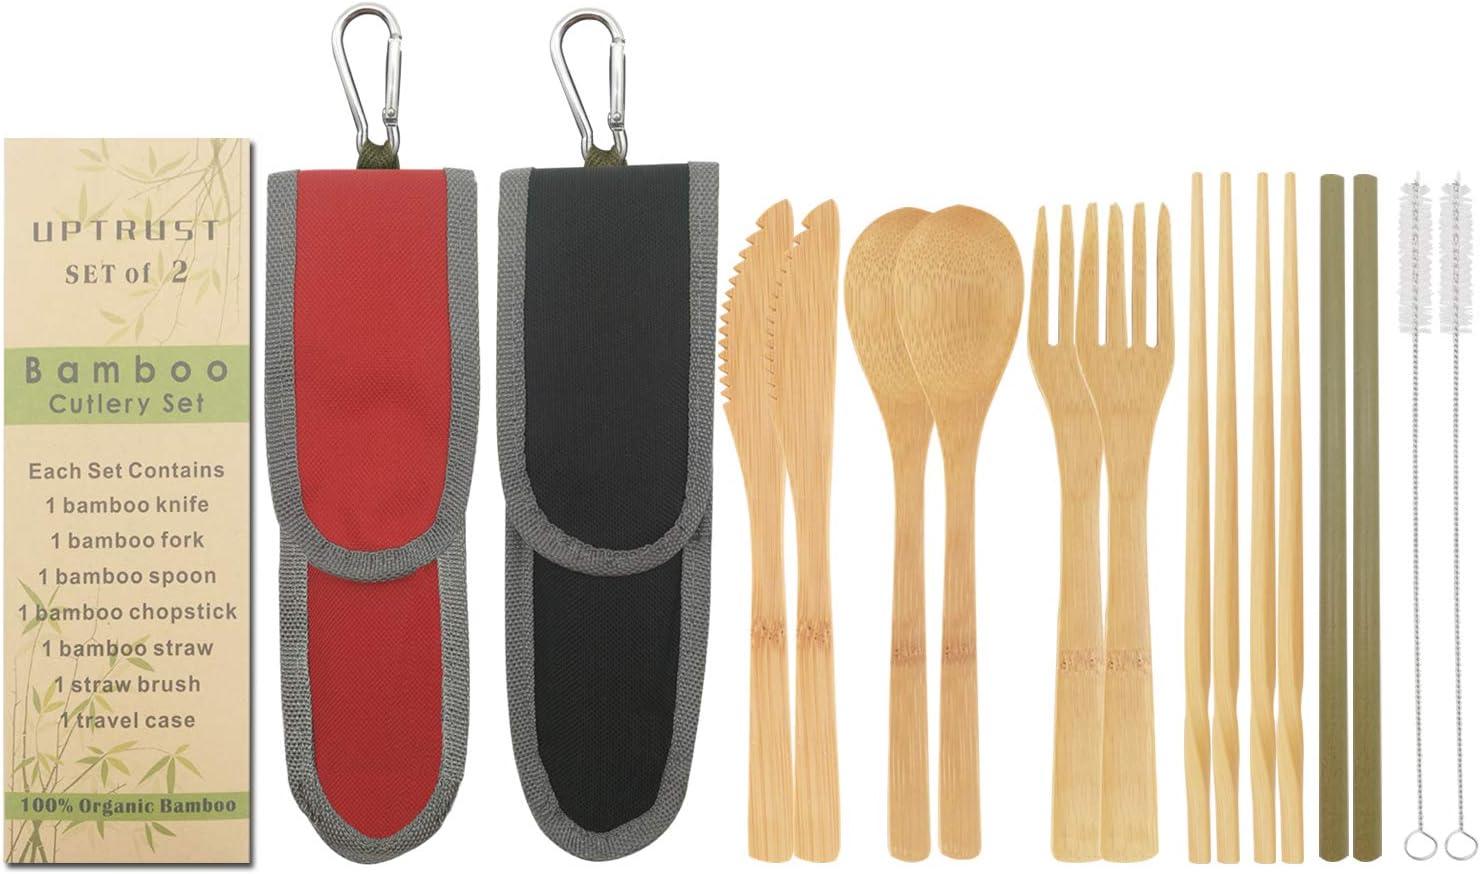 UPTRUST 2 Set Bamboo Cutlery Set Bamboo Travel Utensil Reusable Organic Bamboo Utensil Fork Knife Spoon Chopsticks Straw Cleaning Brush for Travel Picnic School Office(Black & Red)